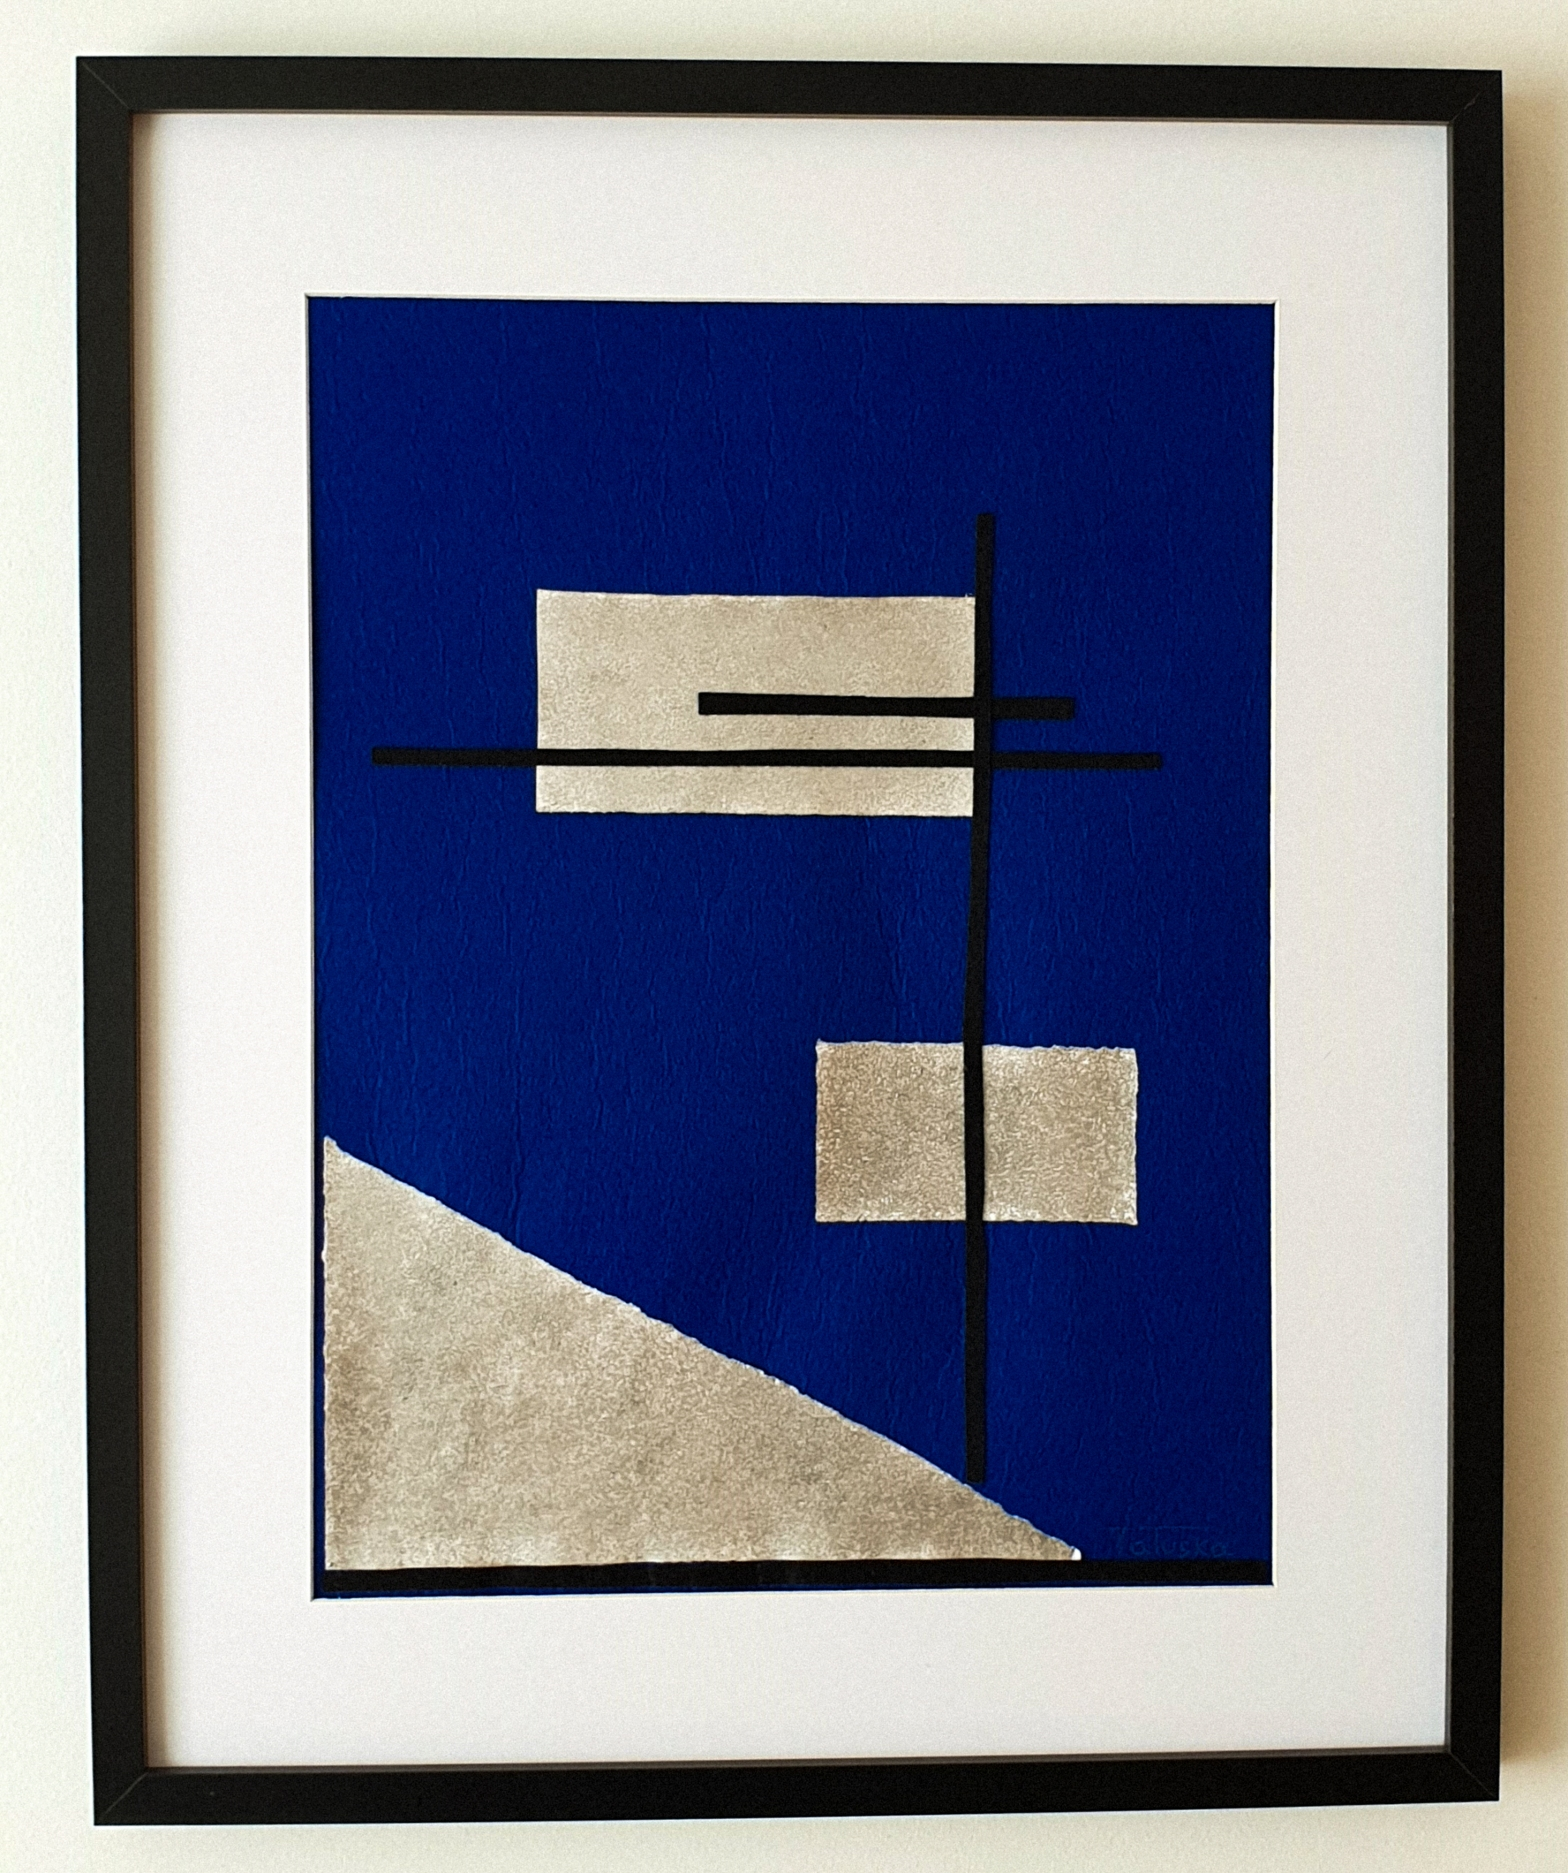 "Cuadro de arte abstracto titulado ""Riding Horse"" de la artista Tatuska (https://artuska.com)."